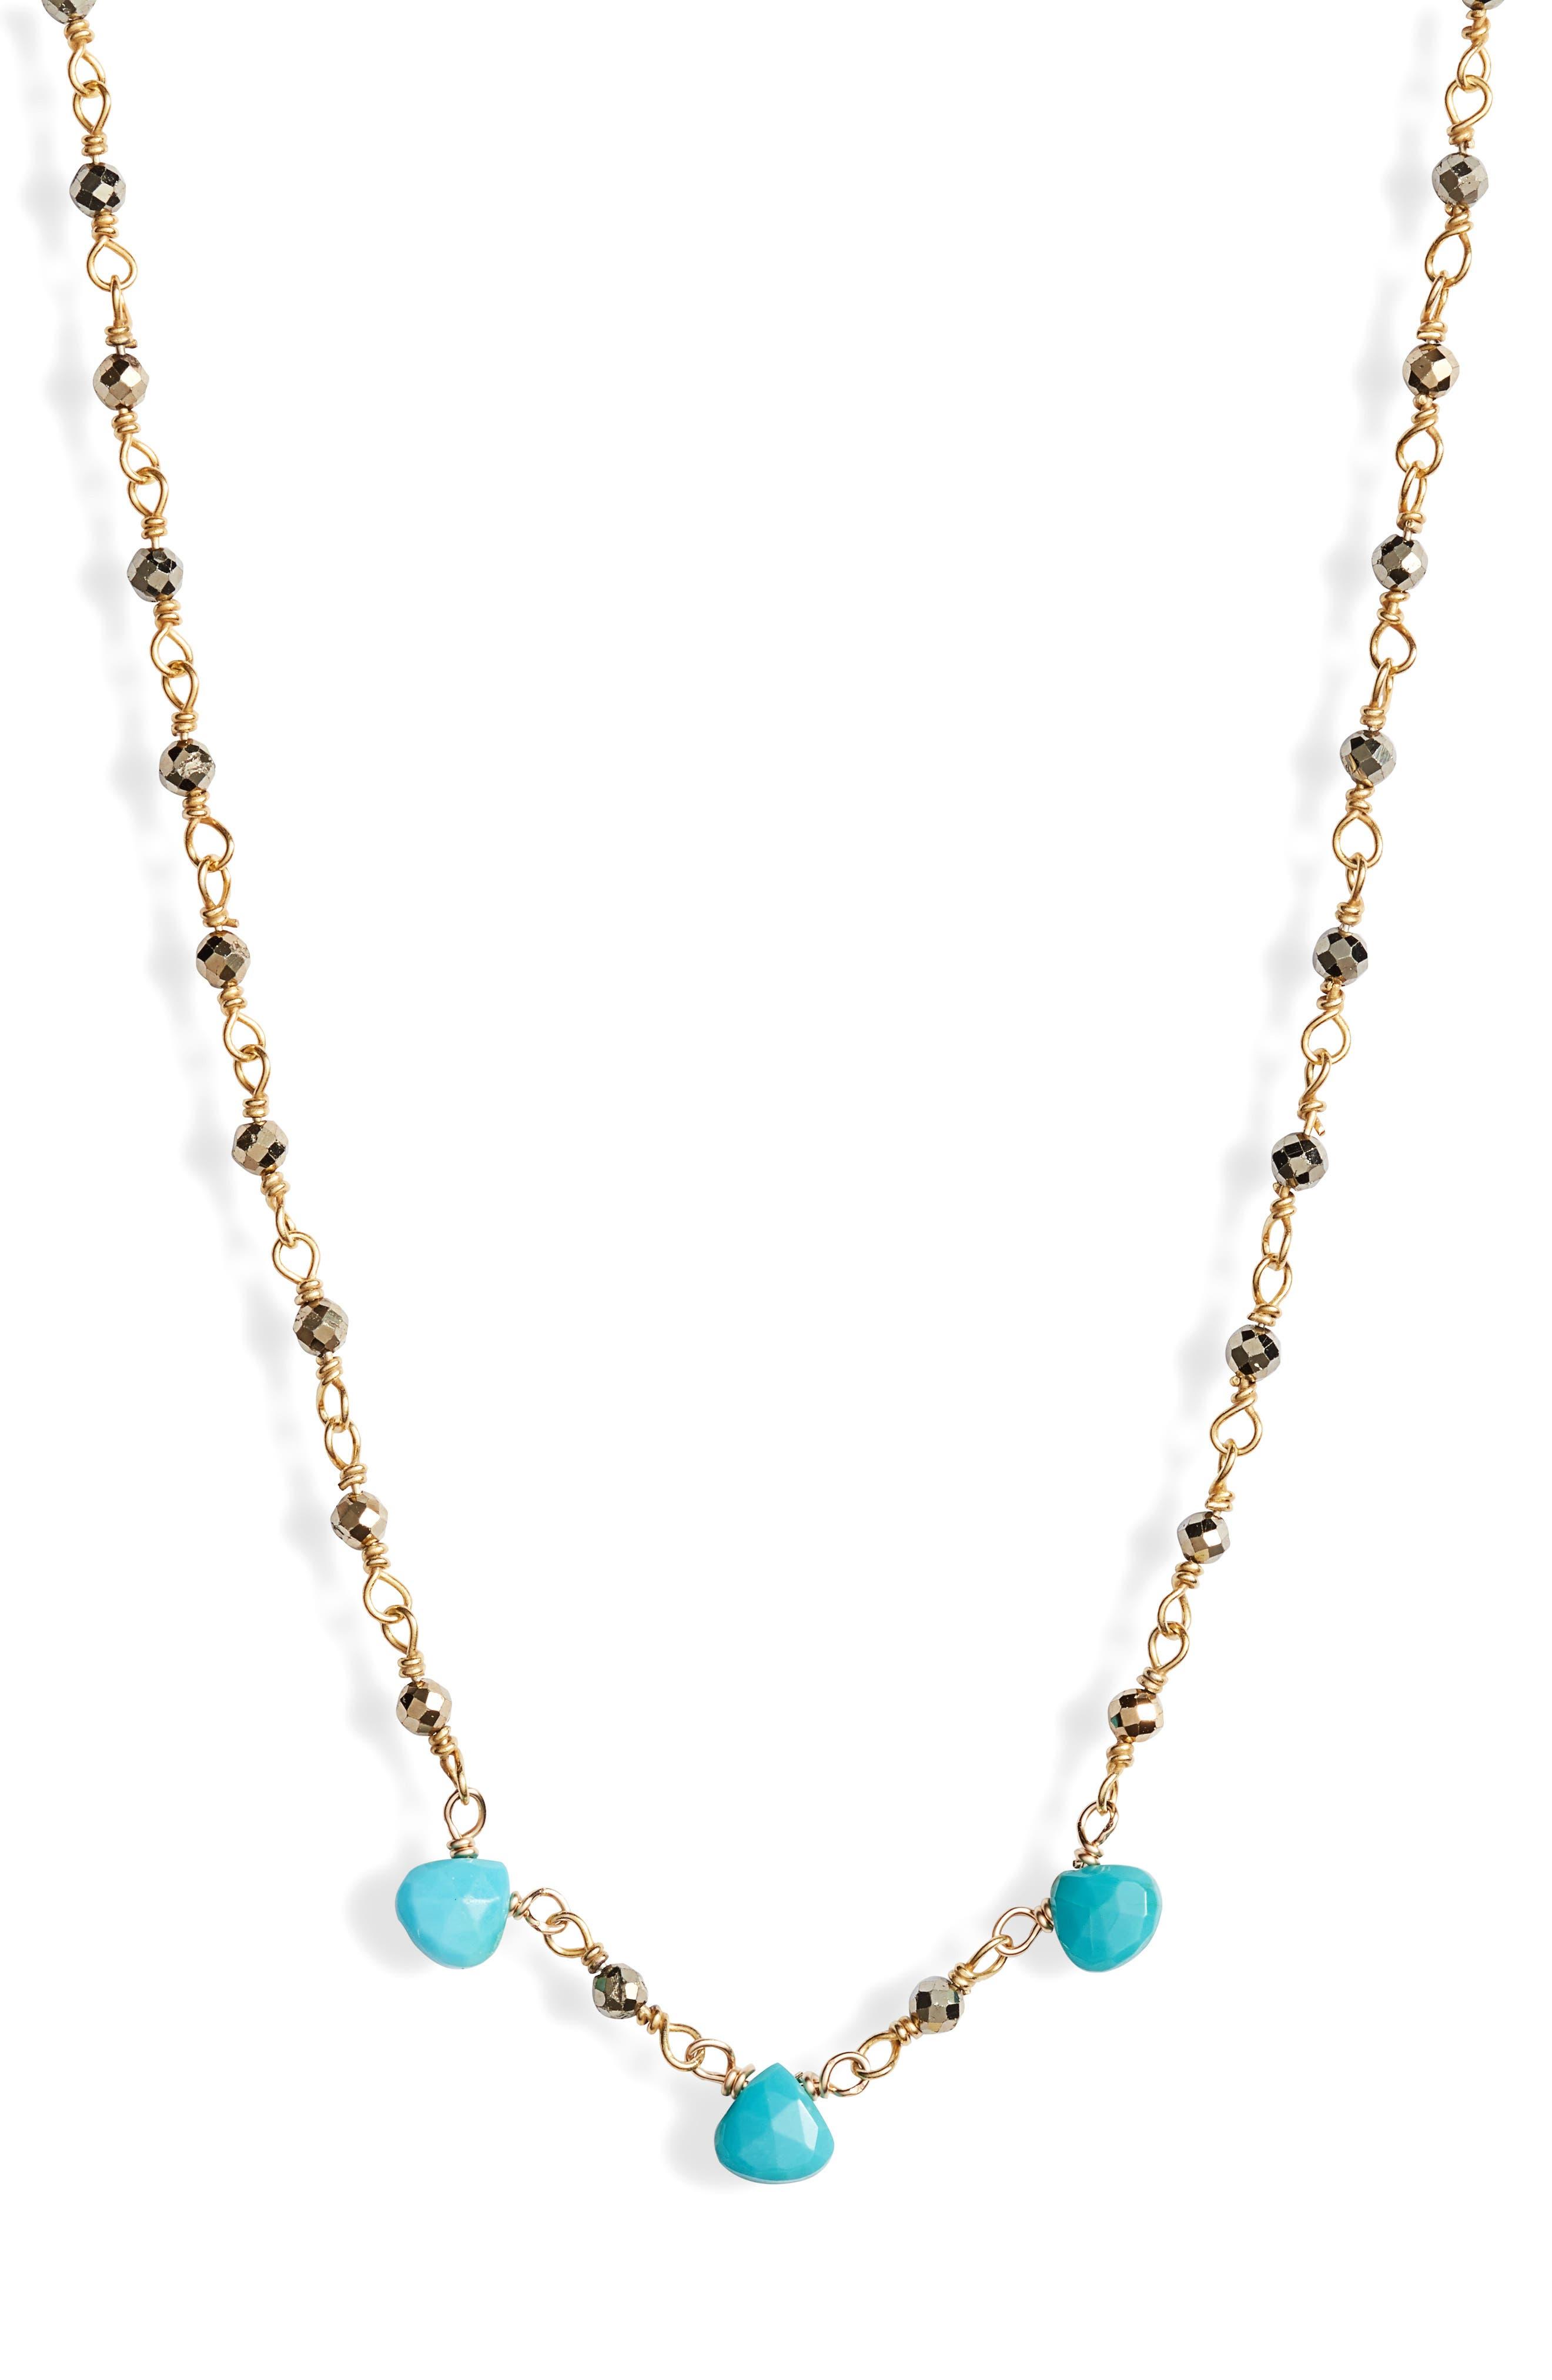 Lori Semiprecious Stone Collar Necklace